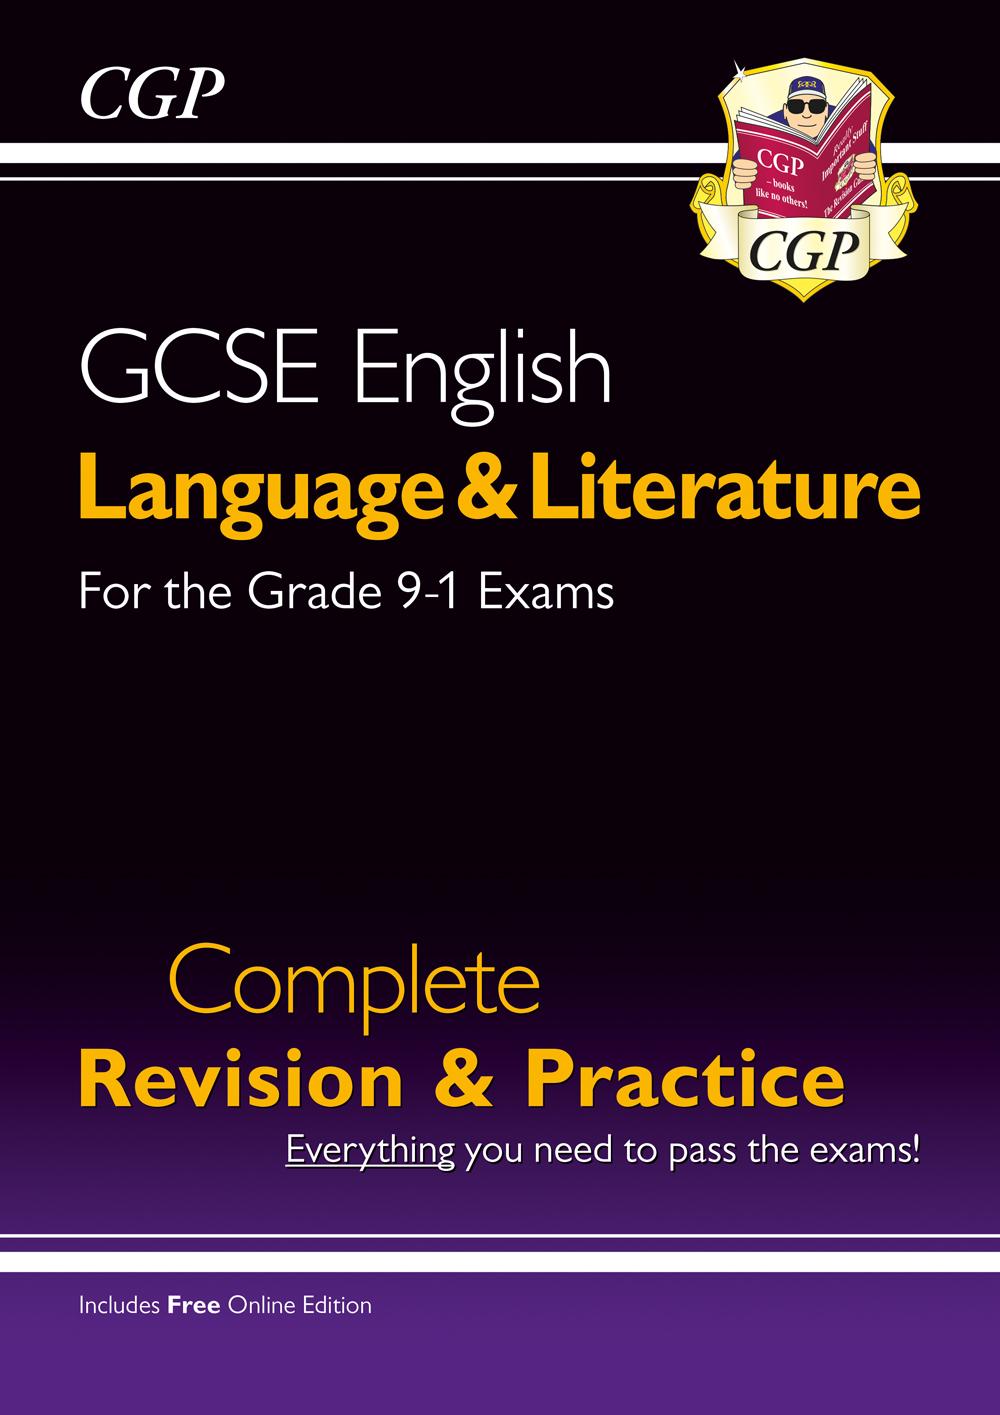 free online english literature courses uk